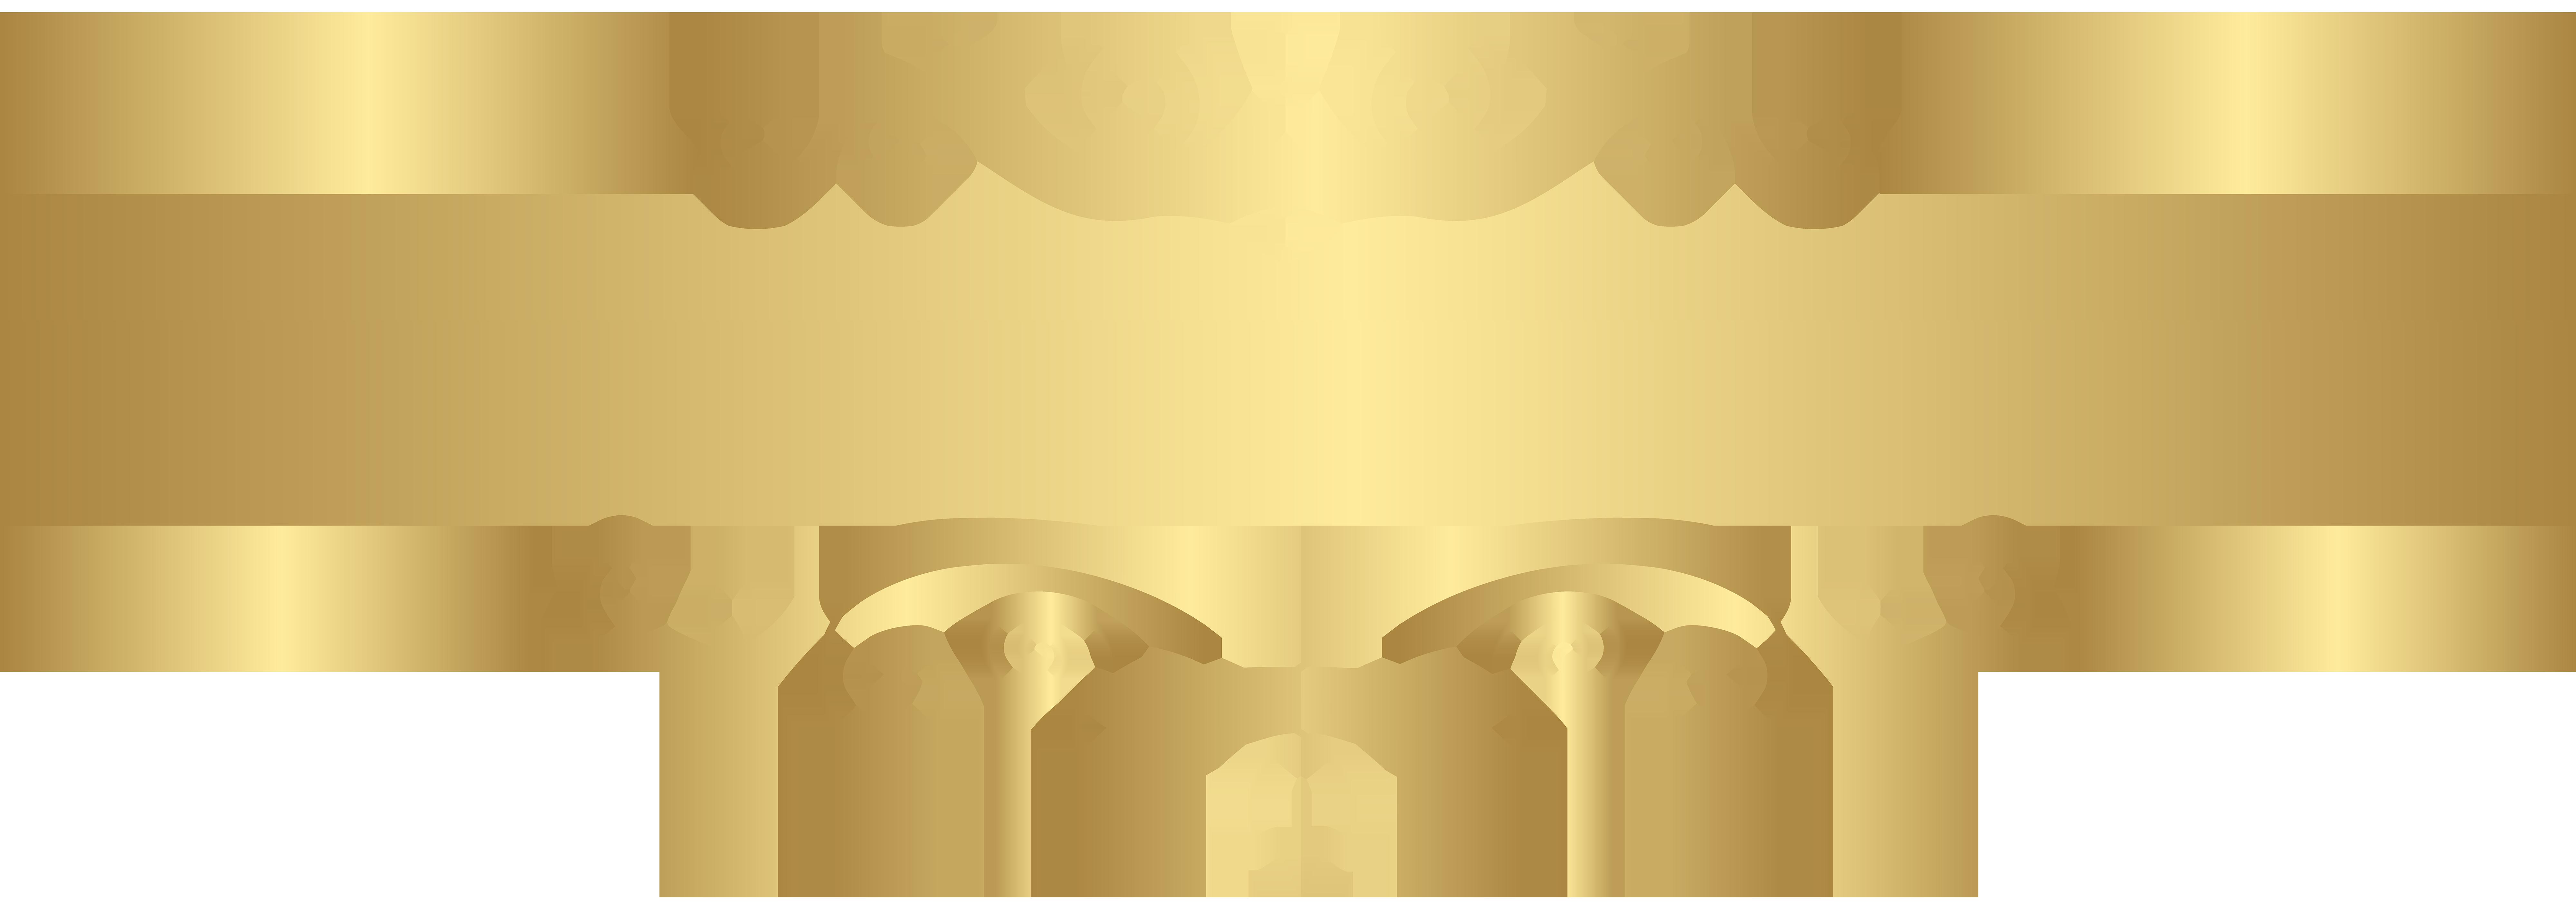 Clipart decorative elements svg black and white stock Gold Decorative Element Transparent Clip Art | Gallery Yopriceville ... svg black and white stock